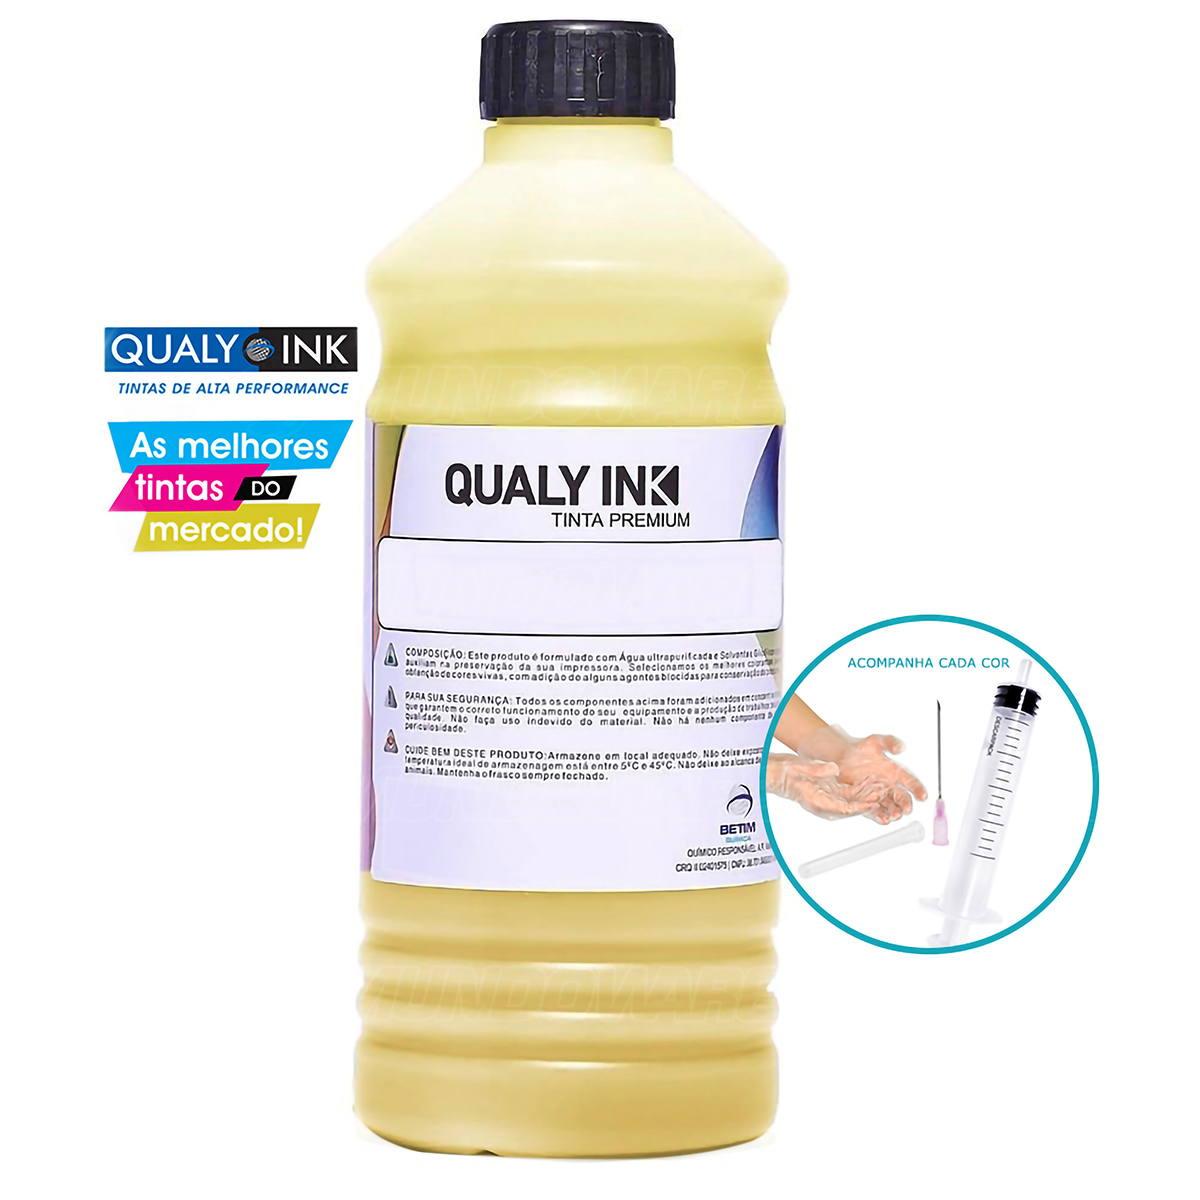 Compatível: Tinta Pigmentada Qualy-Ink YP3E-1535 Série 664 para Epson L120 L200 L355 L365 L475 L555 Amarelo 1L